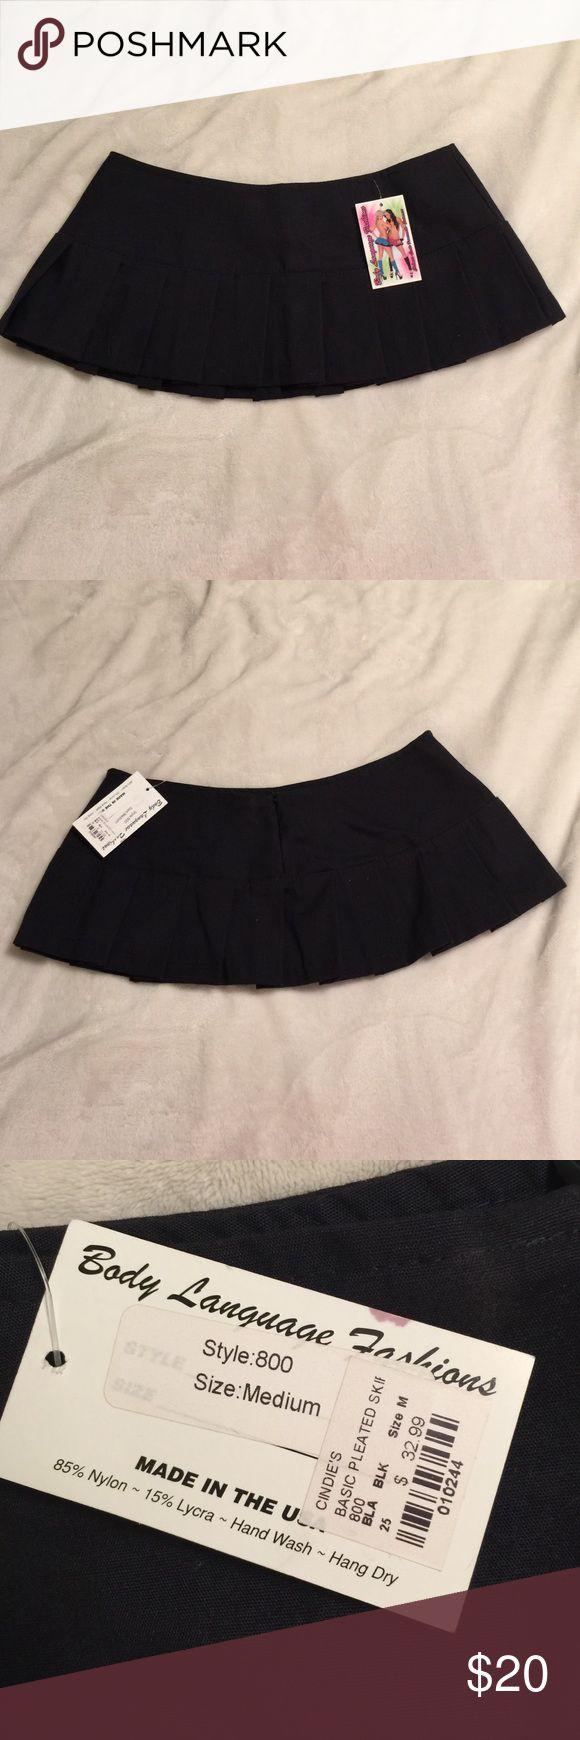 Black micro mini skirt Nwt Skirts Mini